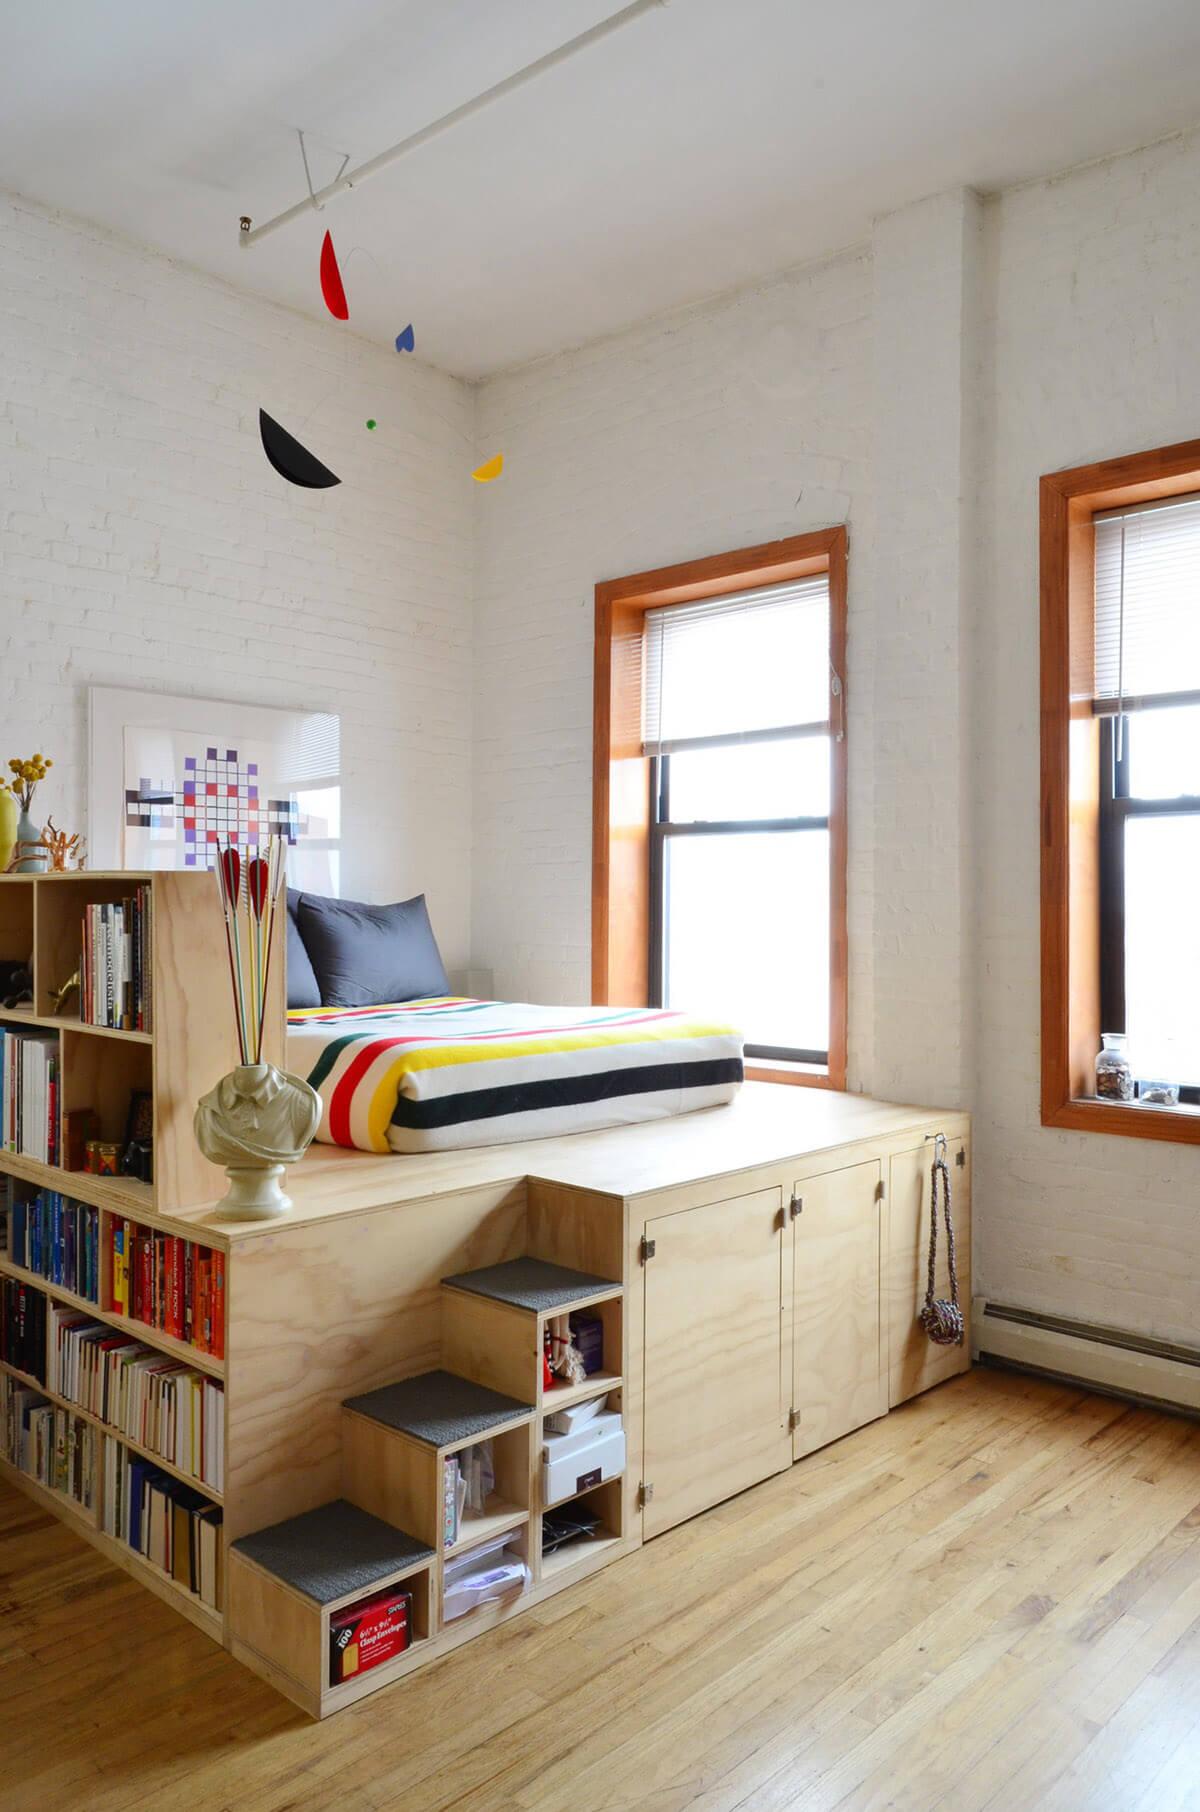 comment am nager une petite chambre coucher 15 id es. Black Bedroom Furniture Sets. Home Design Ideas